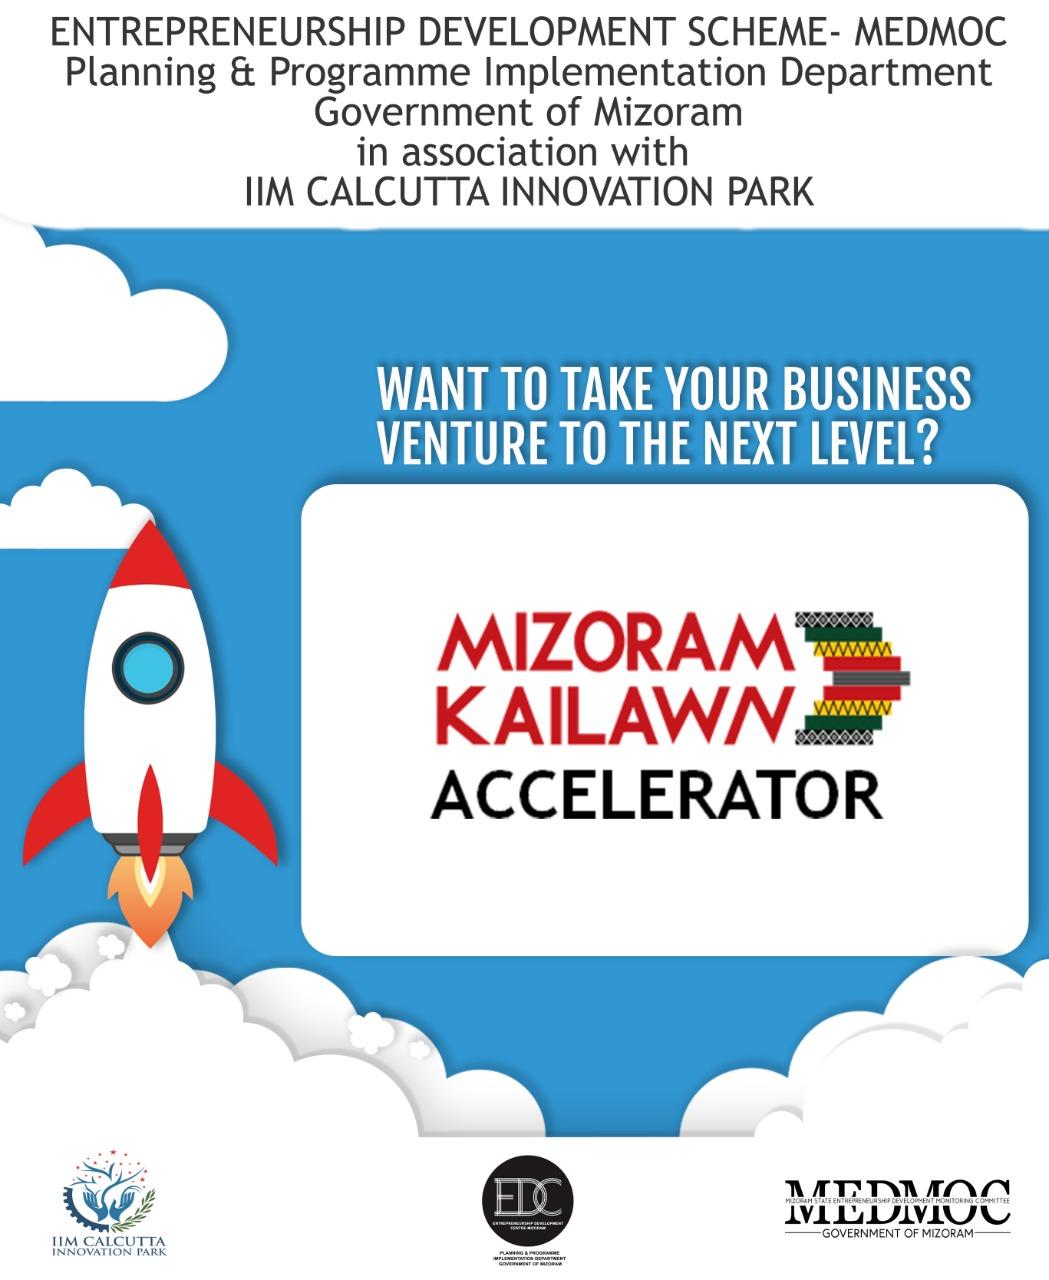 Mizoram Kailawn Accelerator Program